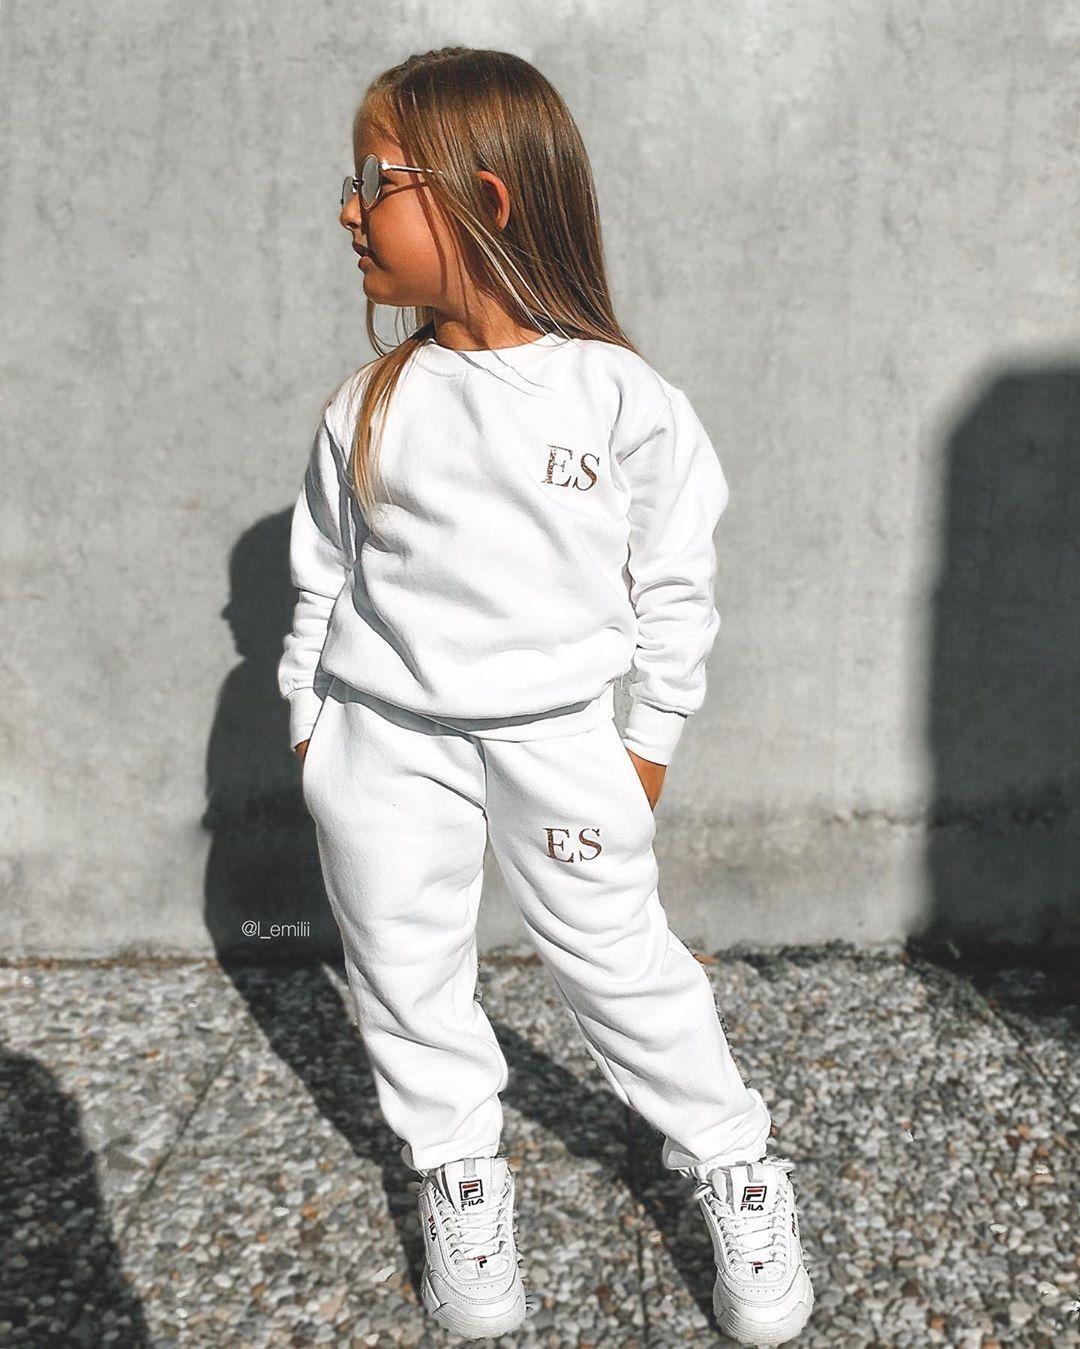 📸 @l_emilii: Cool outfits from @ittybittyboutiqueuk personalized with her Name 😍😍just amazing tracksuit @ittybittyboutiqueuk 🦄 use our code EMILI for discount ❣️ . #cutest_kiddies#fantastickiddies#fabolous_kiddies #thetrendykidz #fashionkids#cutekidsfashion #instaglamkidzz #twinningiswinning #miniinfluencer  #ig_fashionkiddies#minifashionista #kidsfashion #mimomapp#toddlermodel #kissinfashion #fashiongoalsz #fashionzine #ootdbloggers #ootdguide #stylefashion